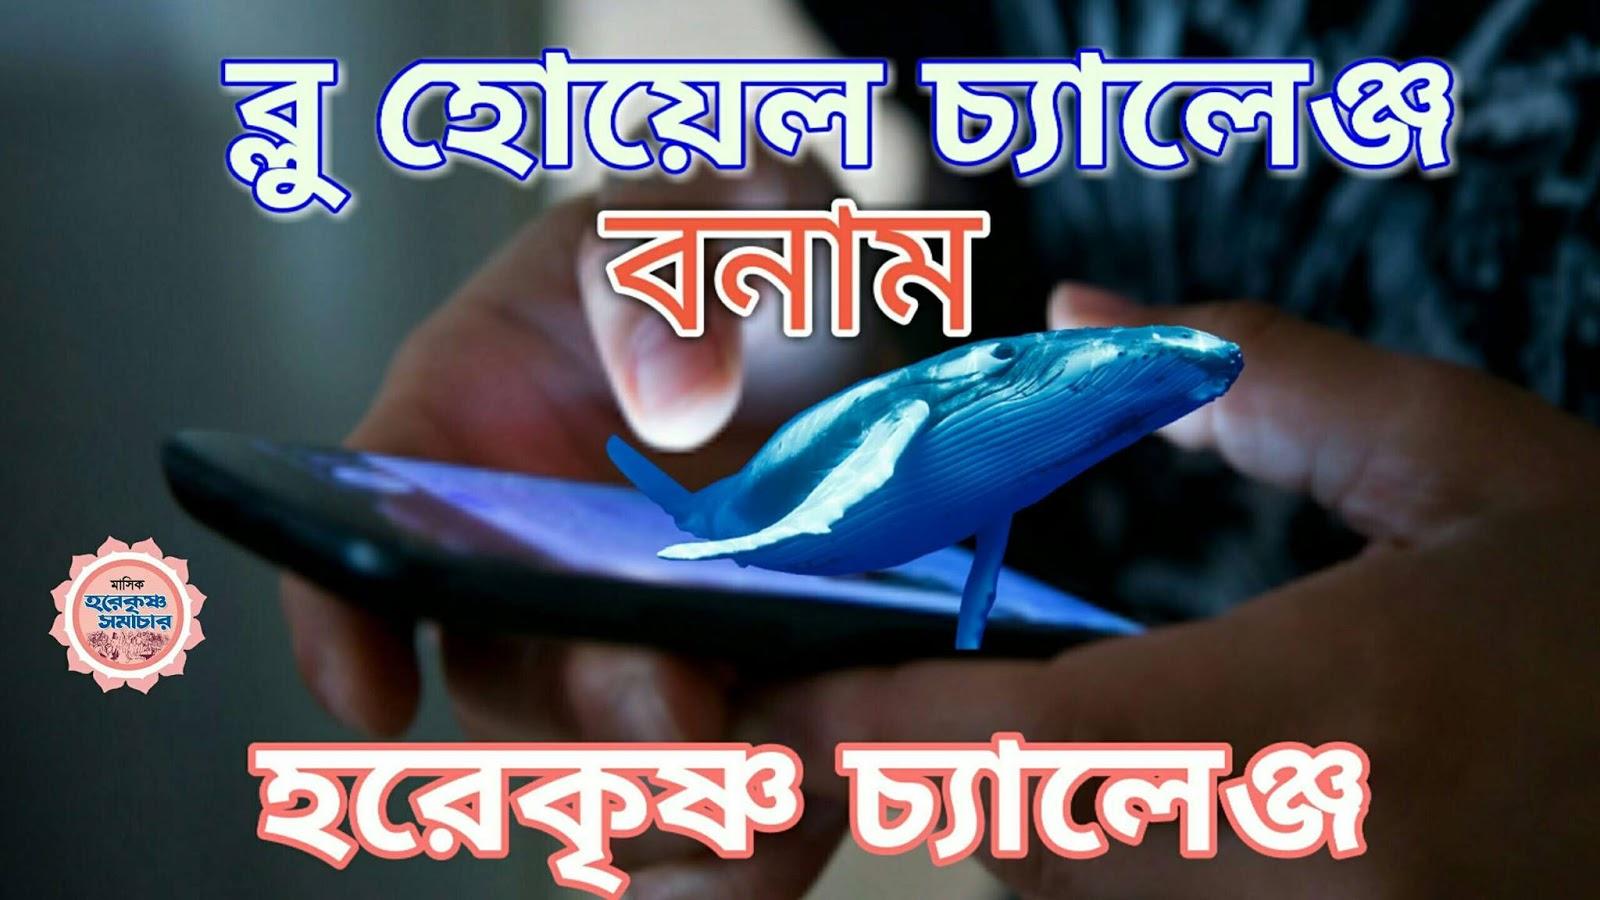 blue-whale-challenge-vs-hk-challenge